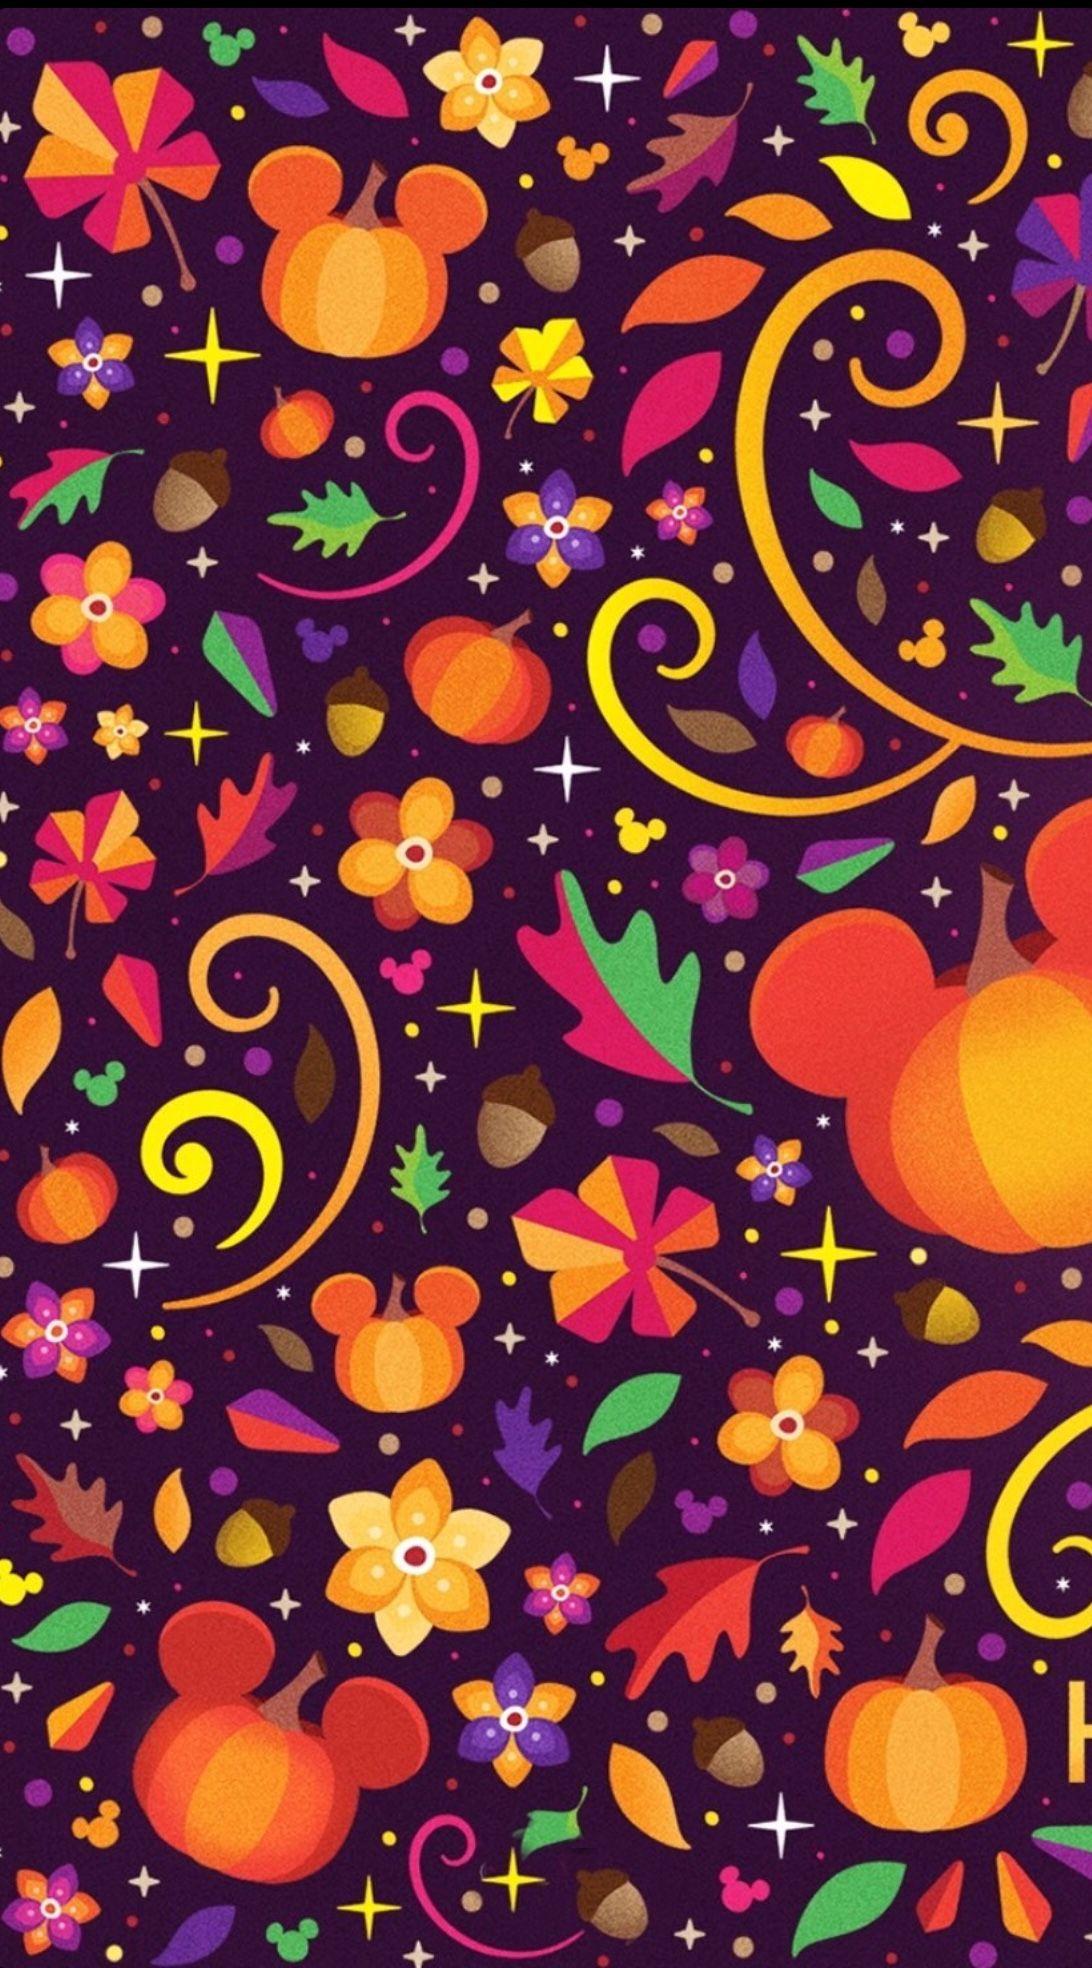 Pin By Brea Roberts On Disney Love Halloween Wallpaper Disney Phone Wallpaper Disney Phone Backgrounds